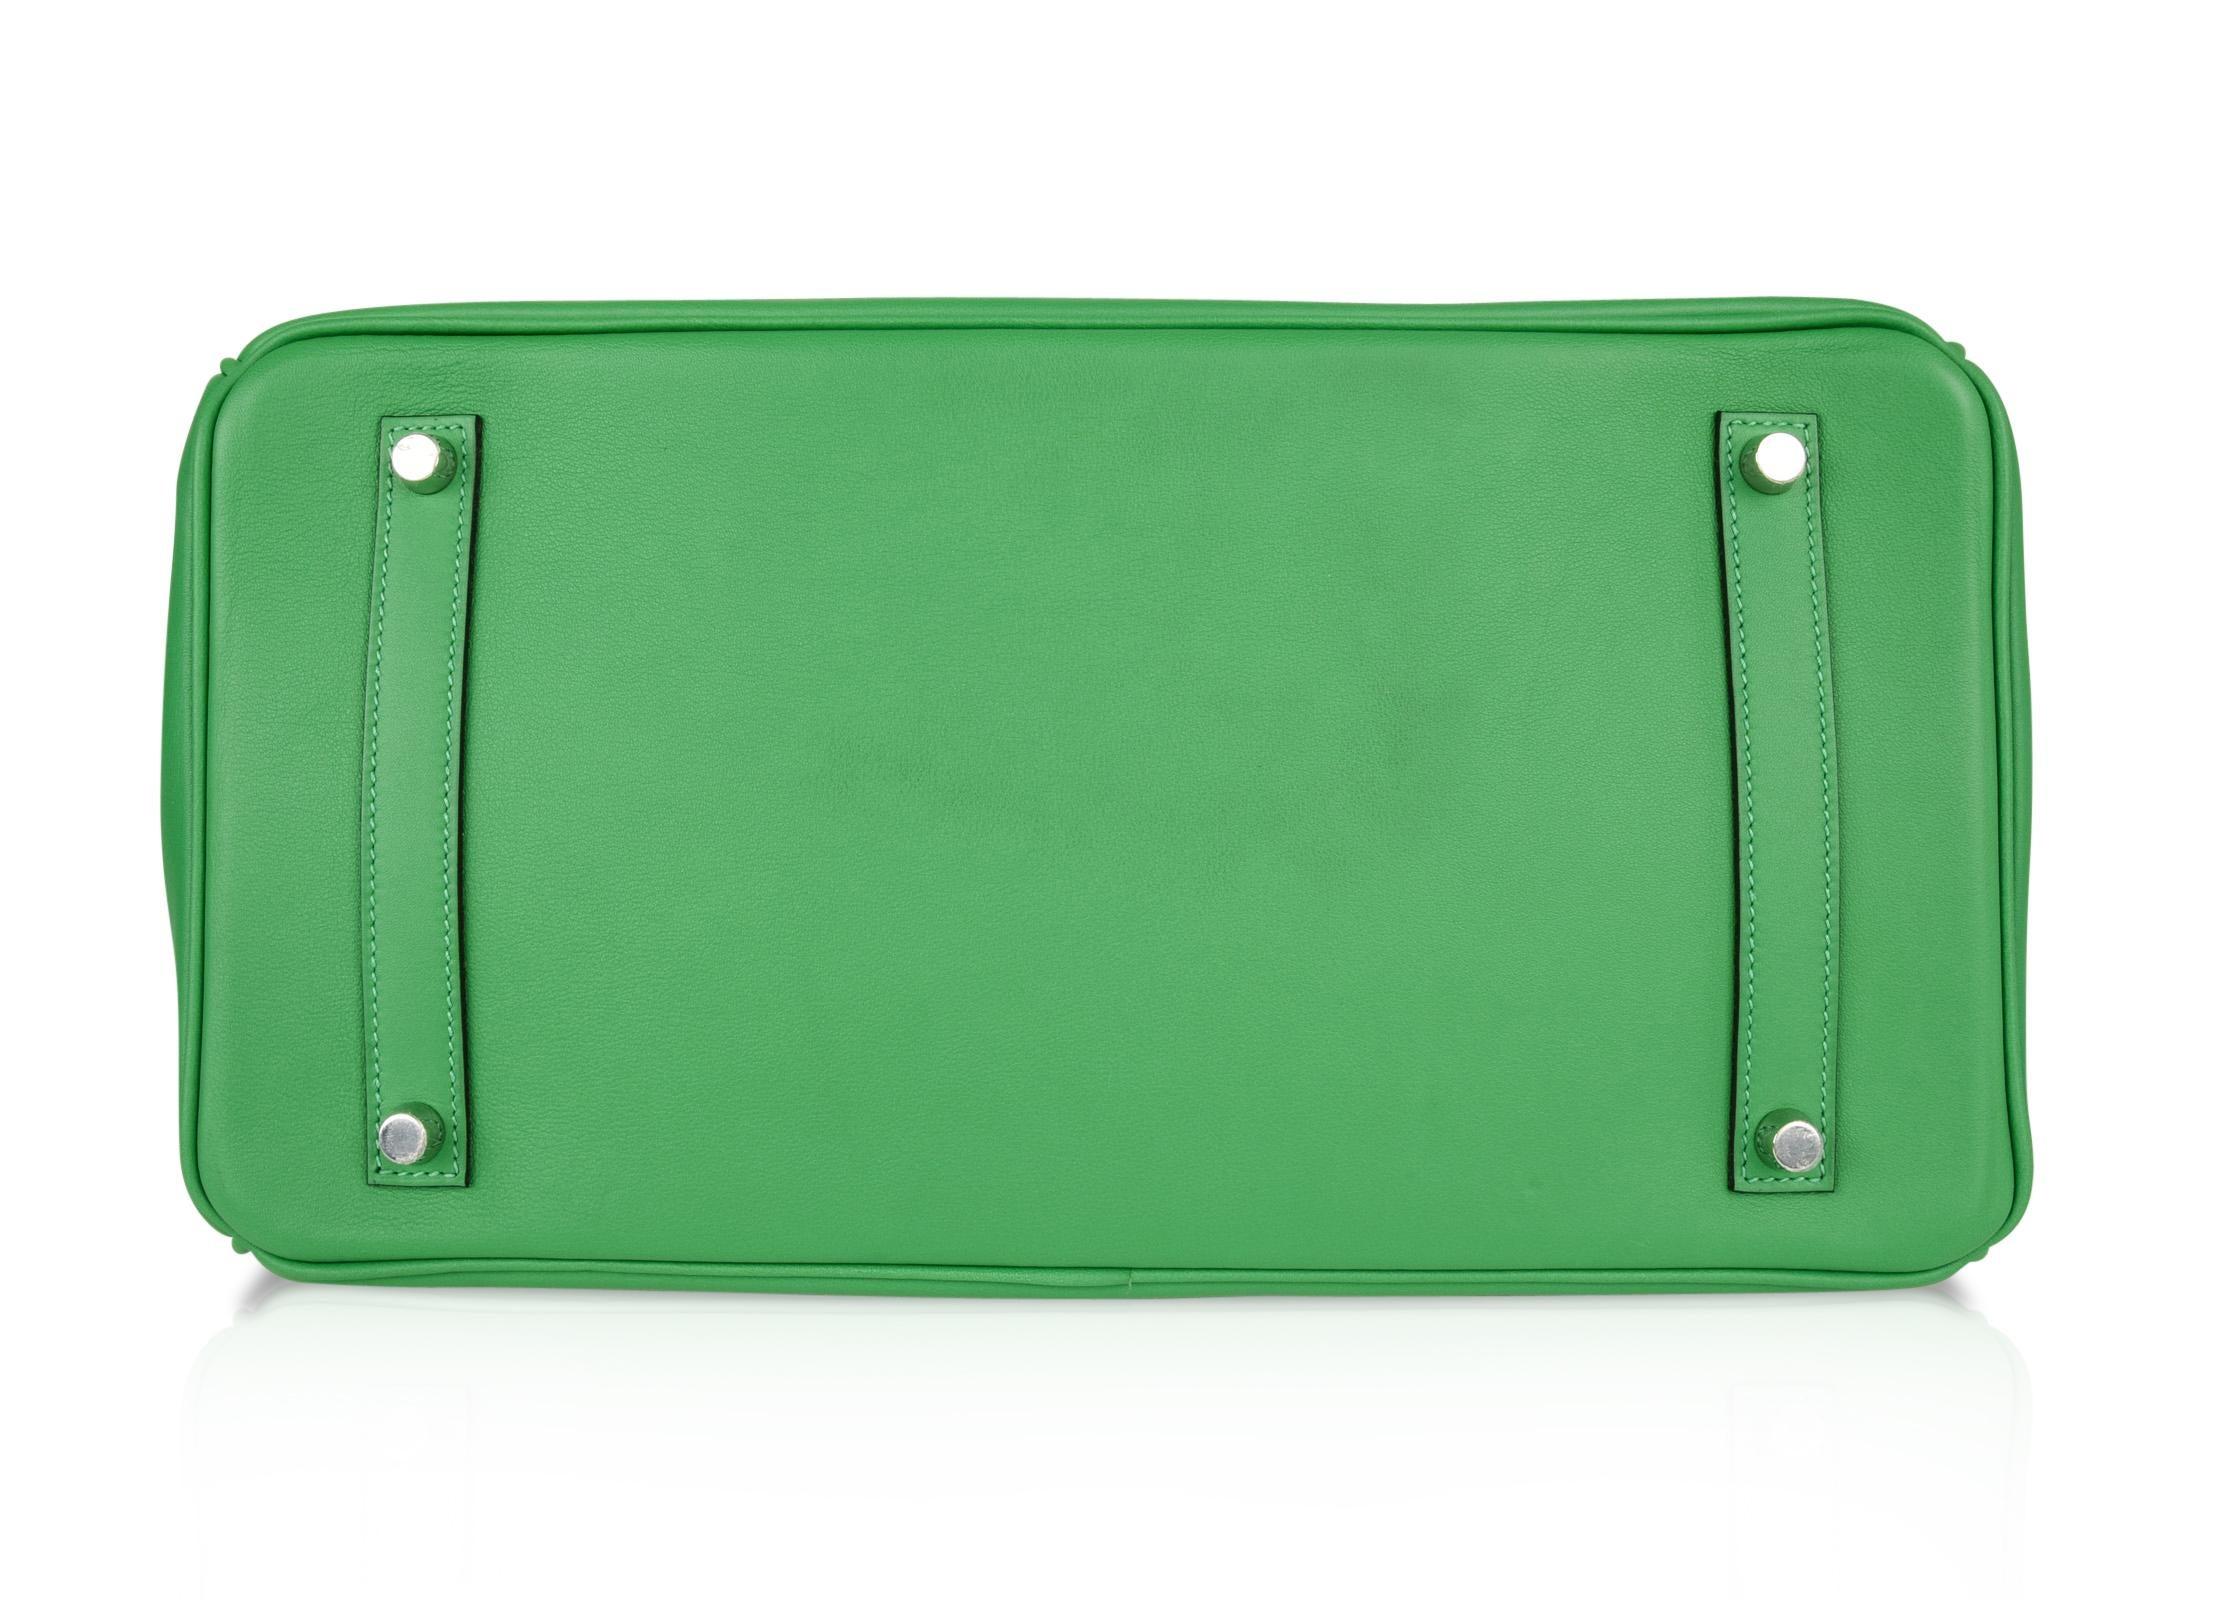 d79afbba0de Hermes Birkin 35 Ghillies Bag Rare Bamboo Palladium Hardware For Sale at  1stdibs